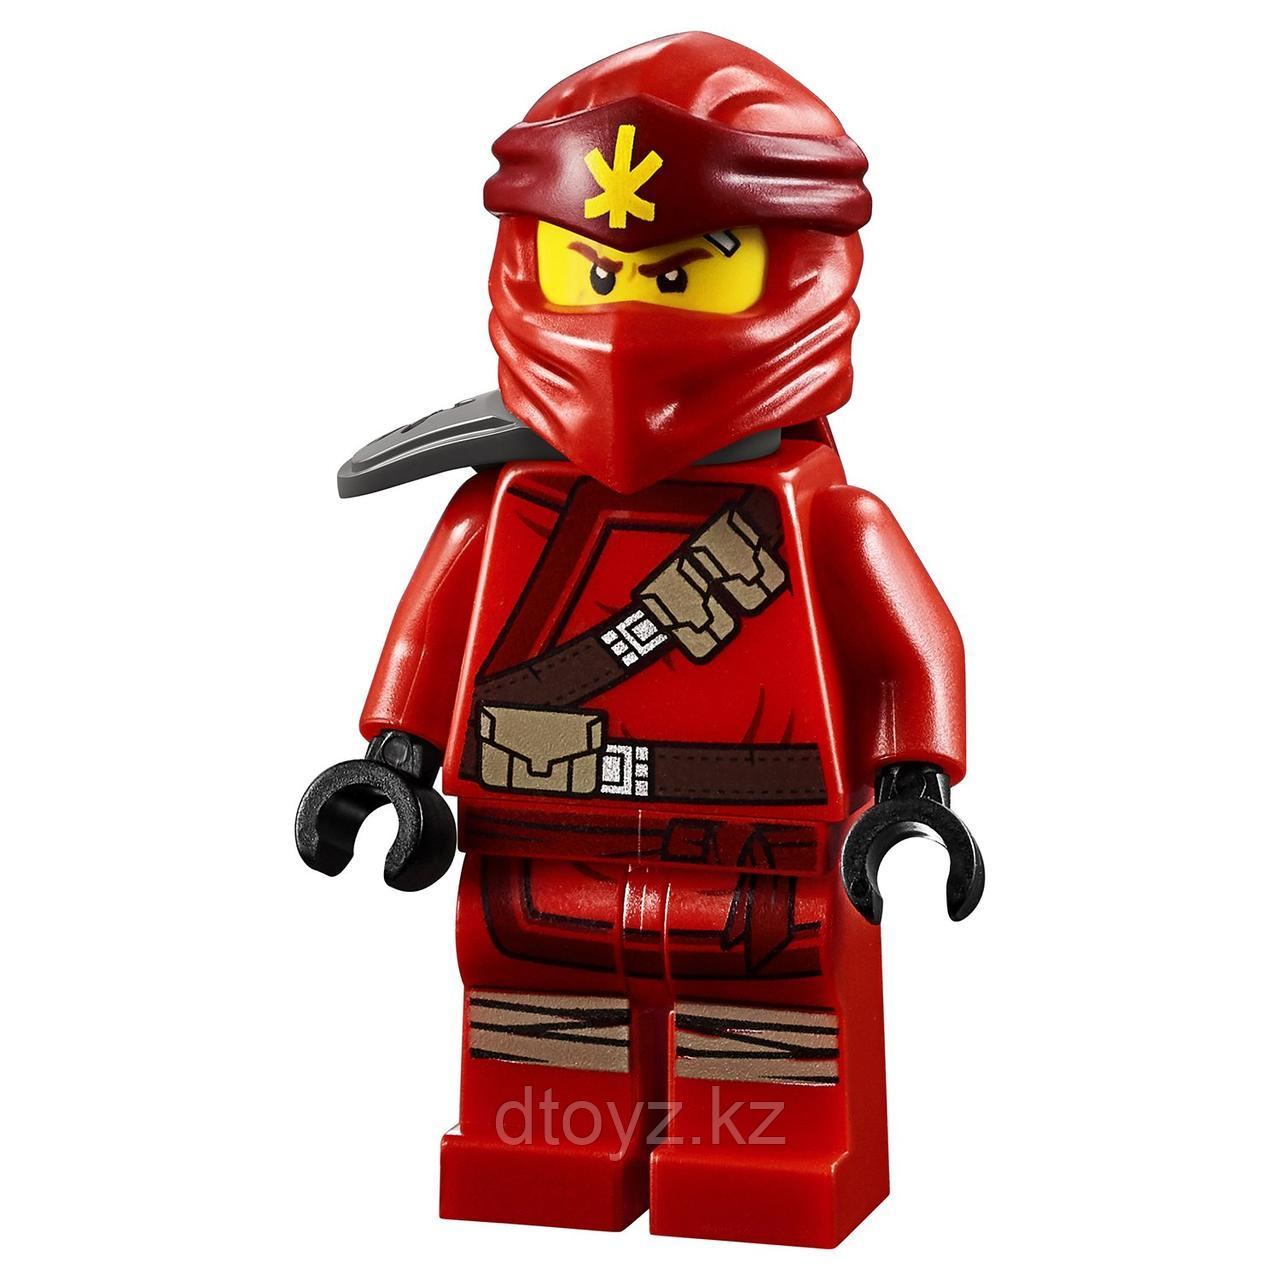 Lego Ninjago 70675 Внедорожник Катана 4x4, Лего Ниндзяго - фото 4